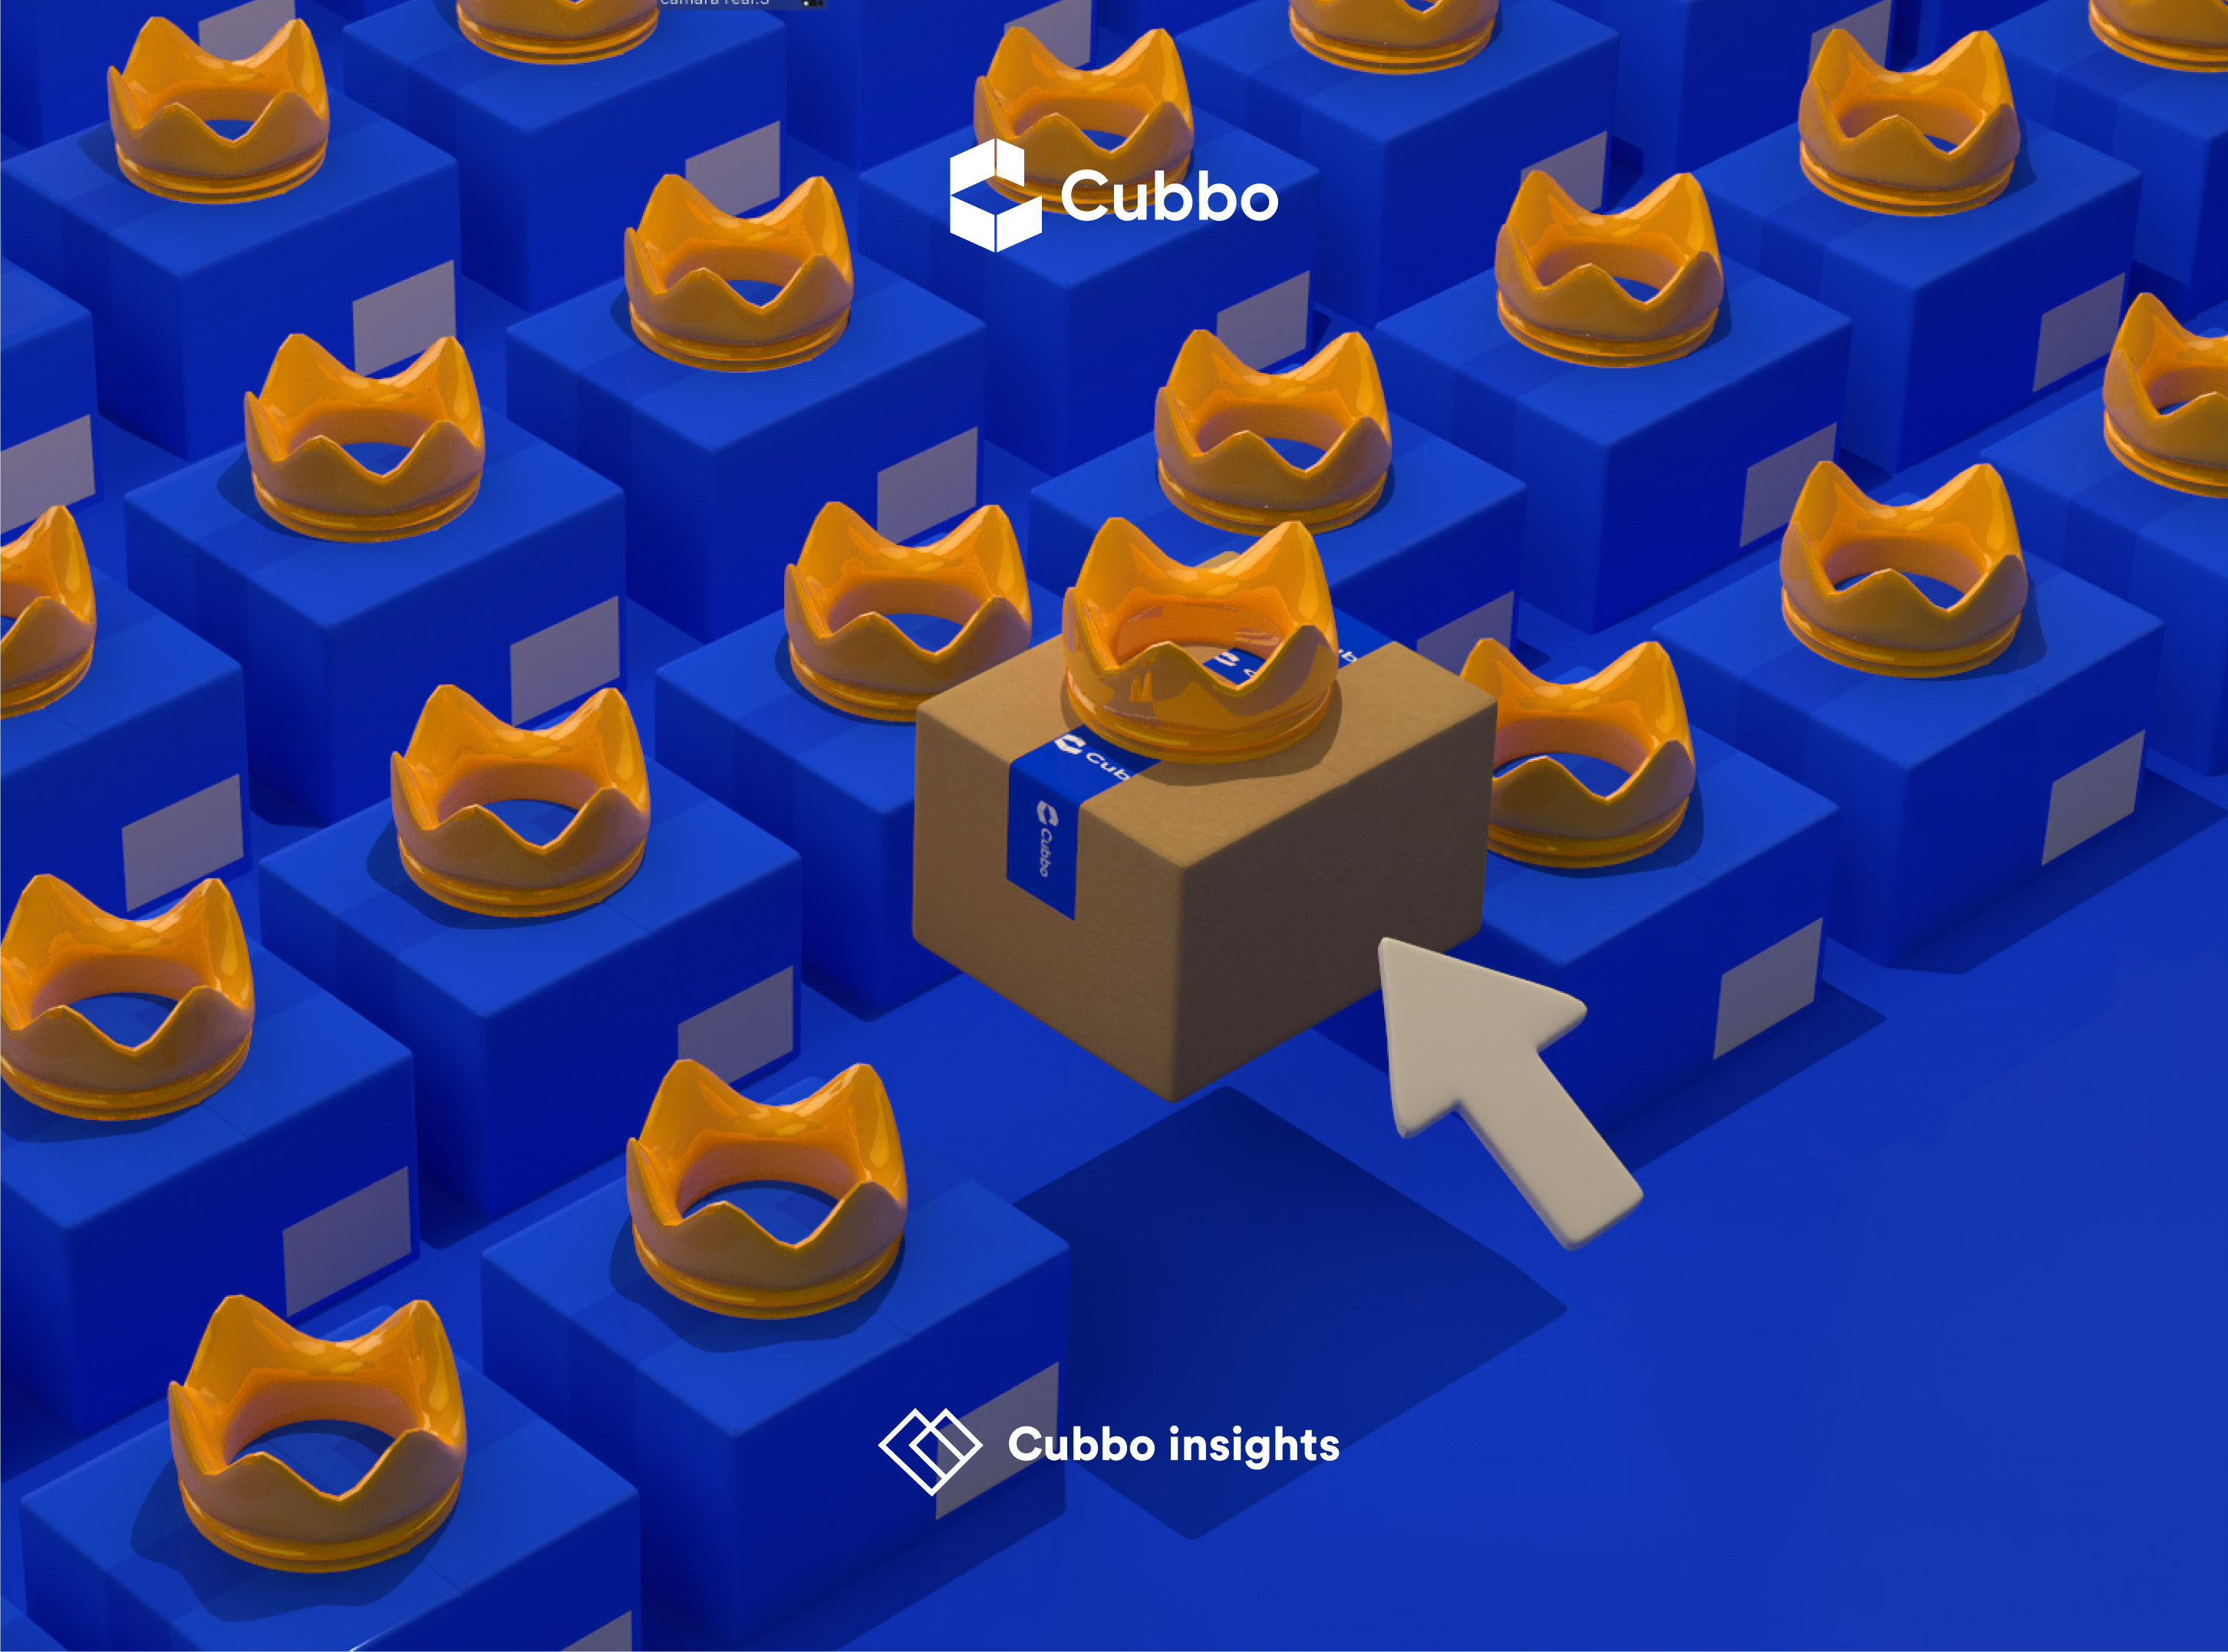 Cubbo - latest blog posts HERO image